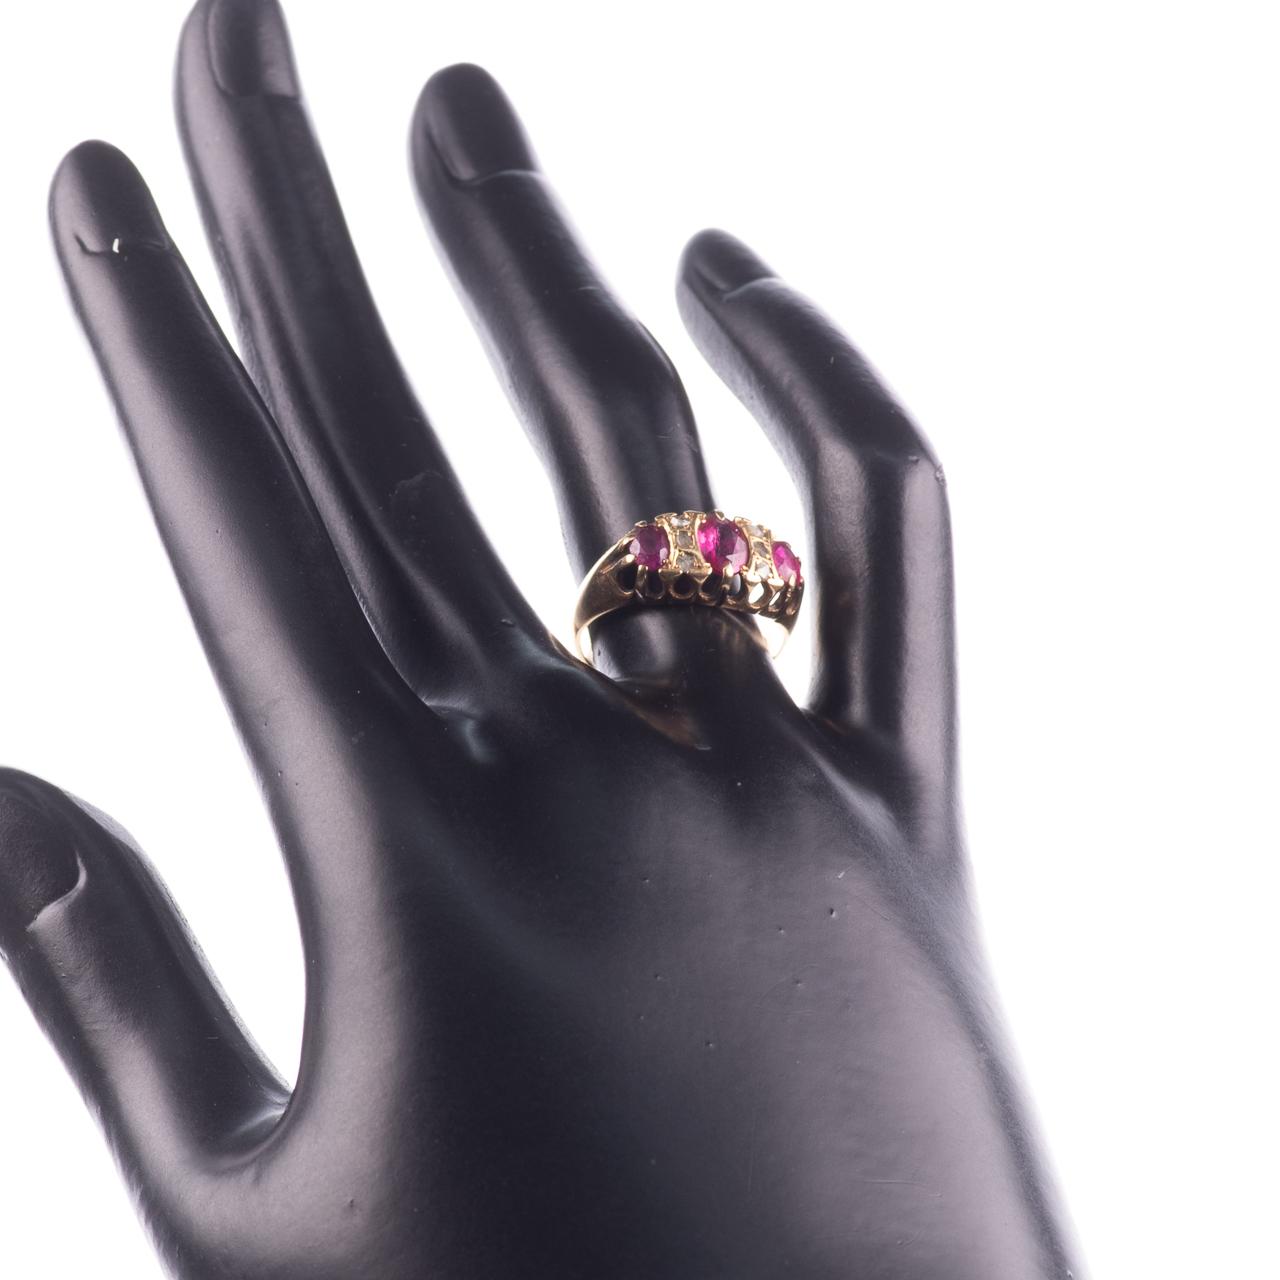 18ct Gold 1.20ct Ruby & Diamond Ring Birmingham 1915 - Image 2 of 7